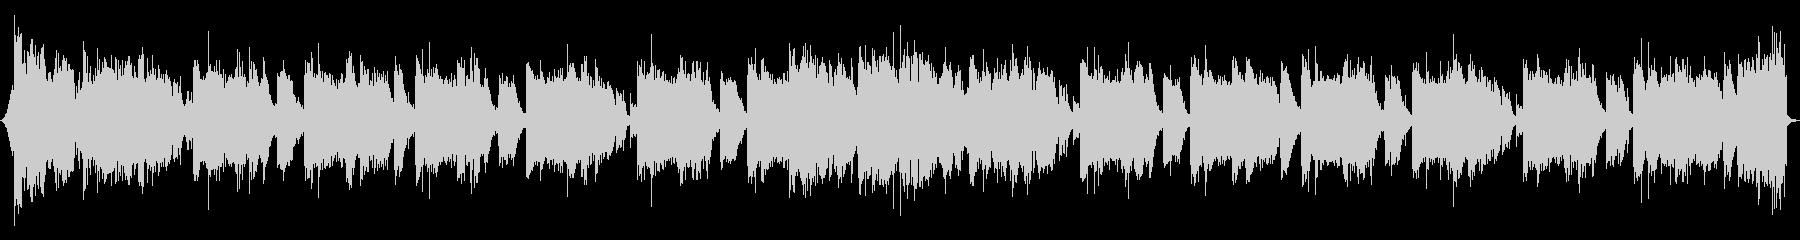 eSportsサイバーロックバンド30秒の未再生の波形